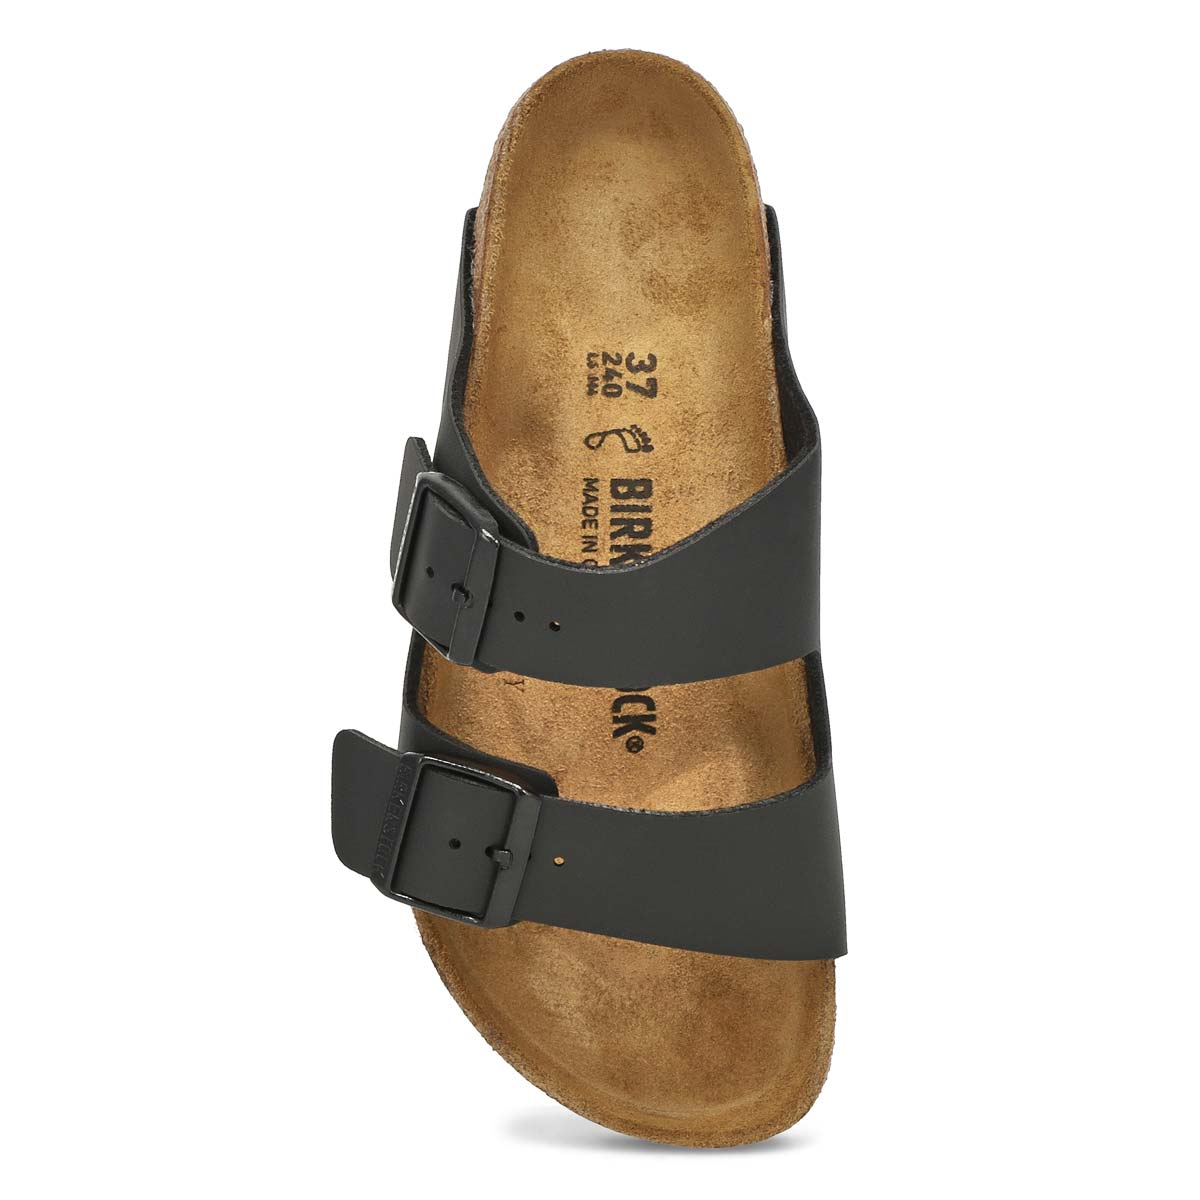 Lds Arizona black 2 strap sandal